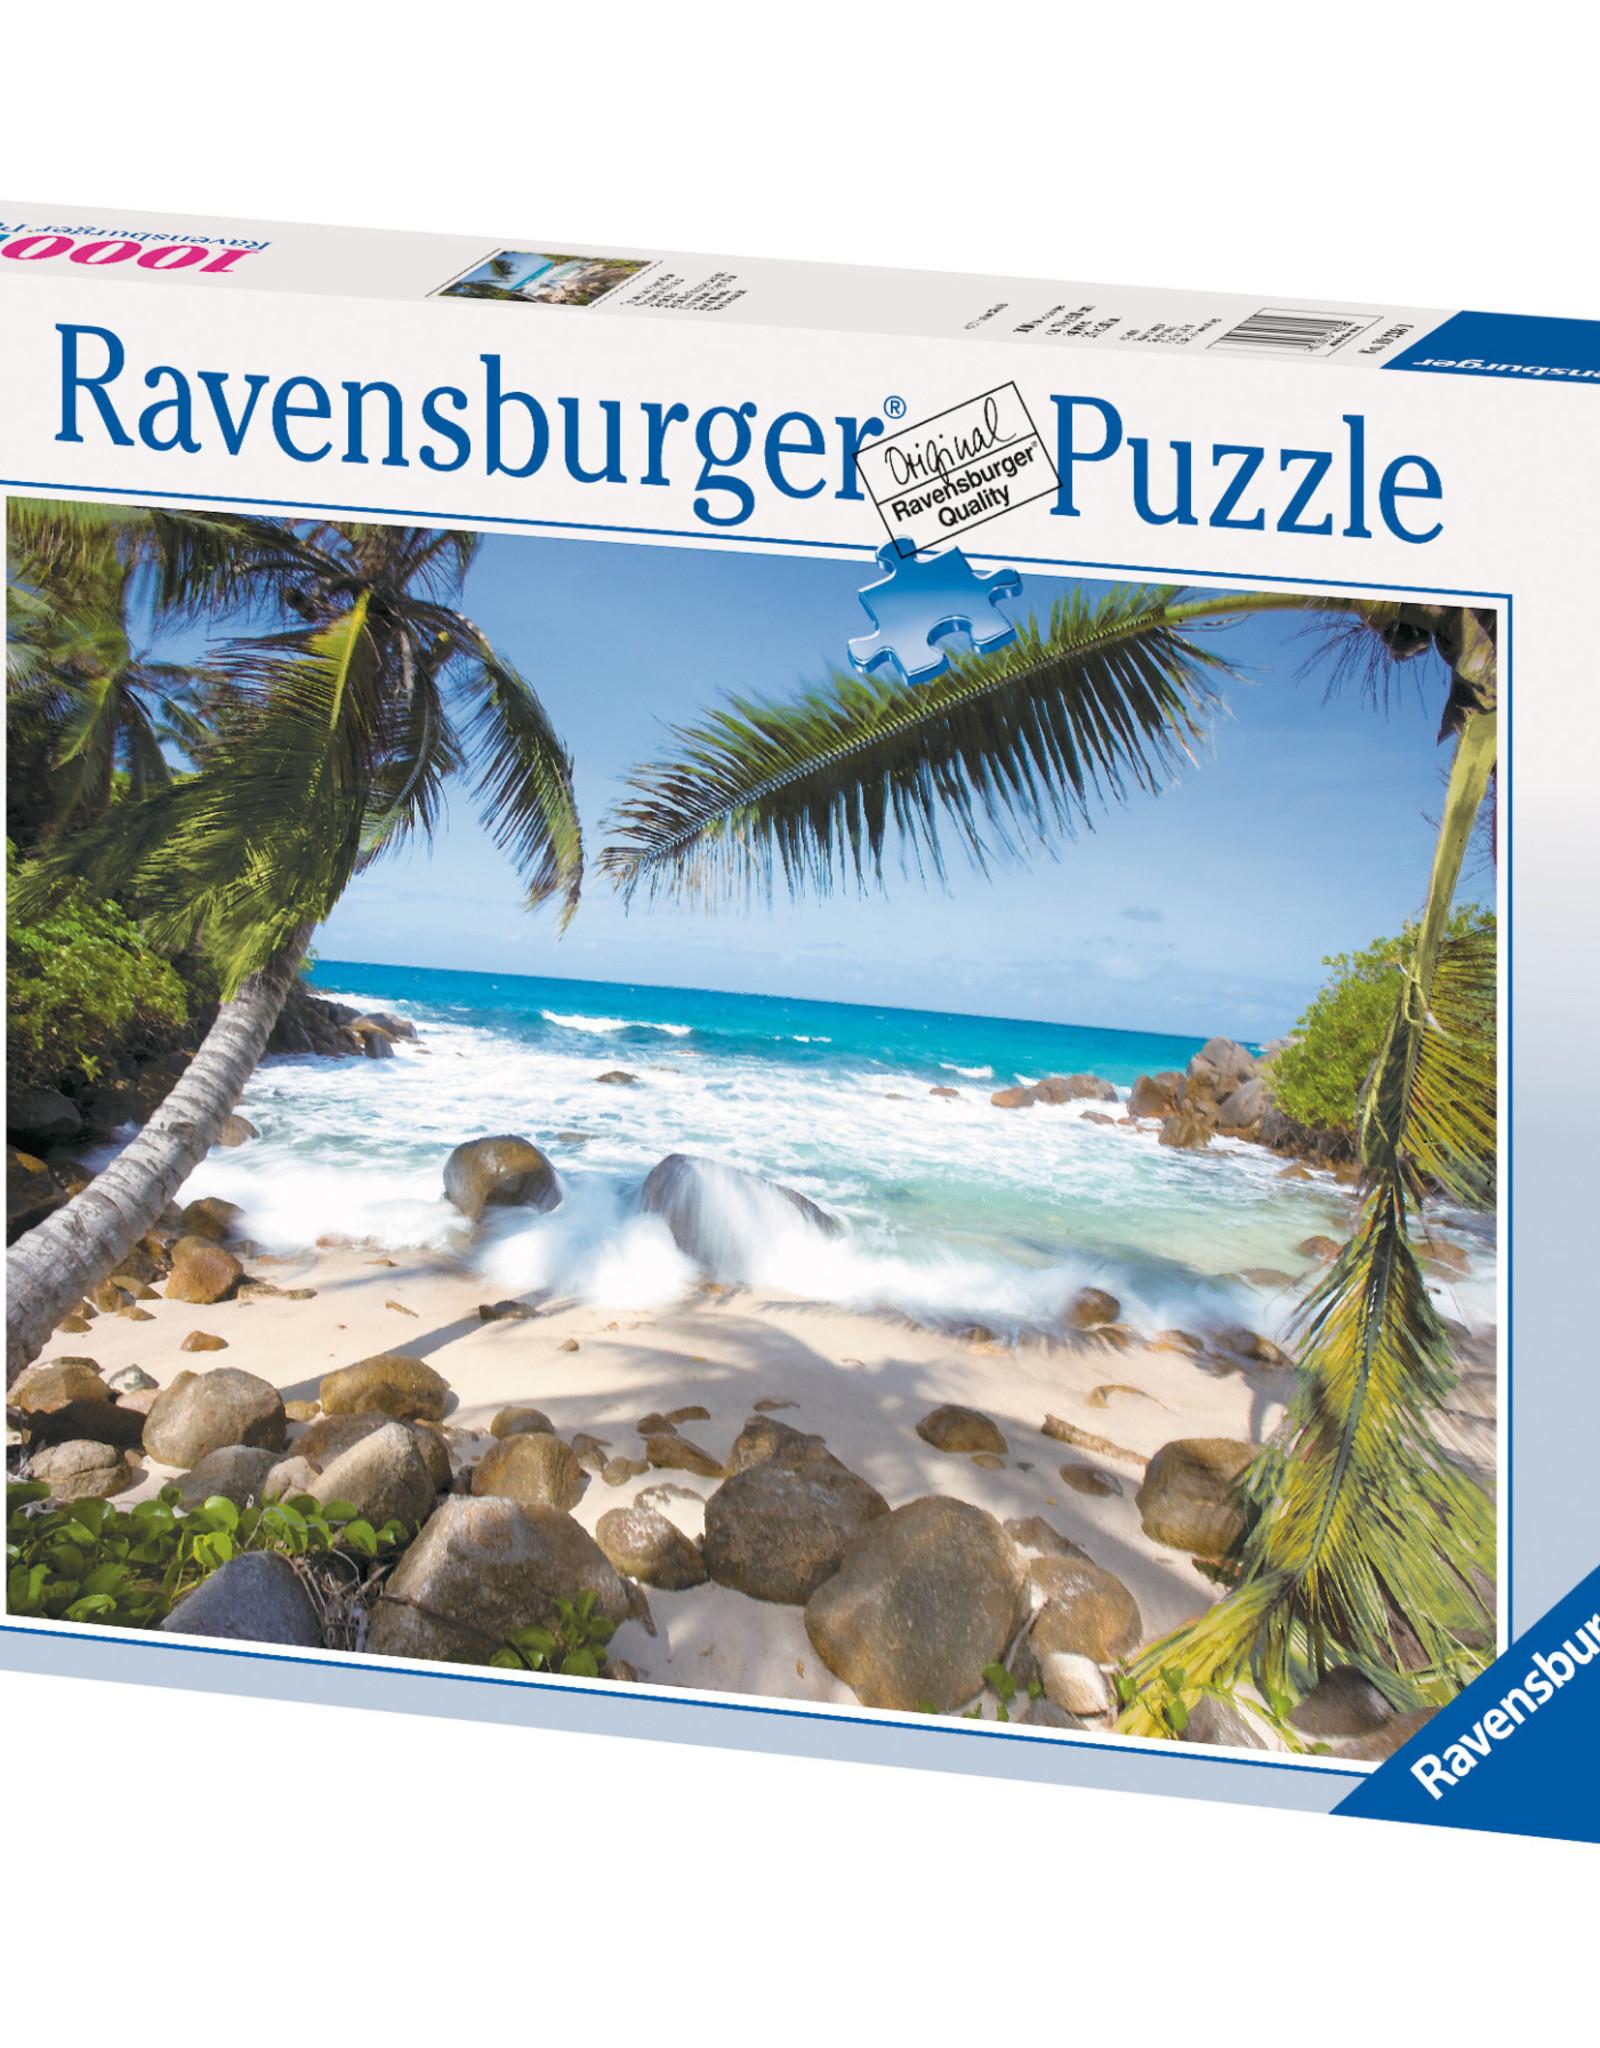 Ravensburger Seaside Beauty 1000pc Puzzle